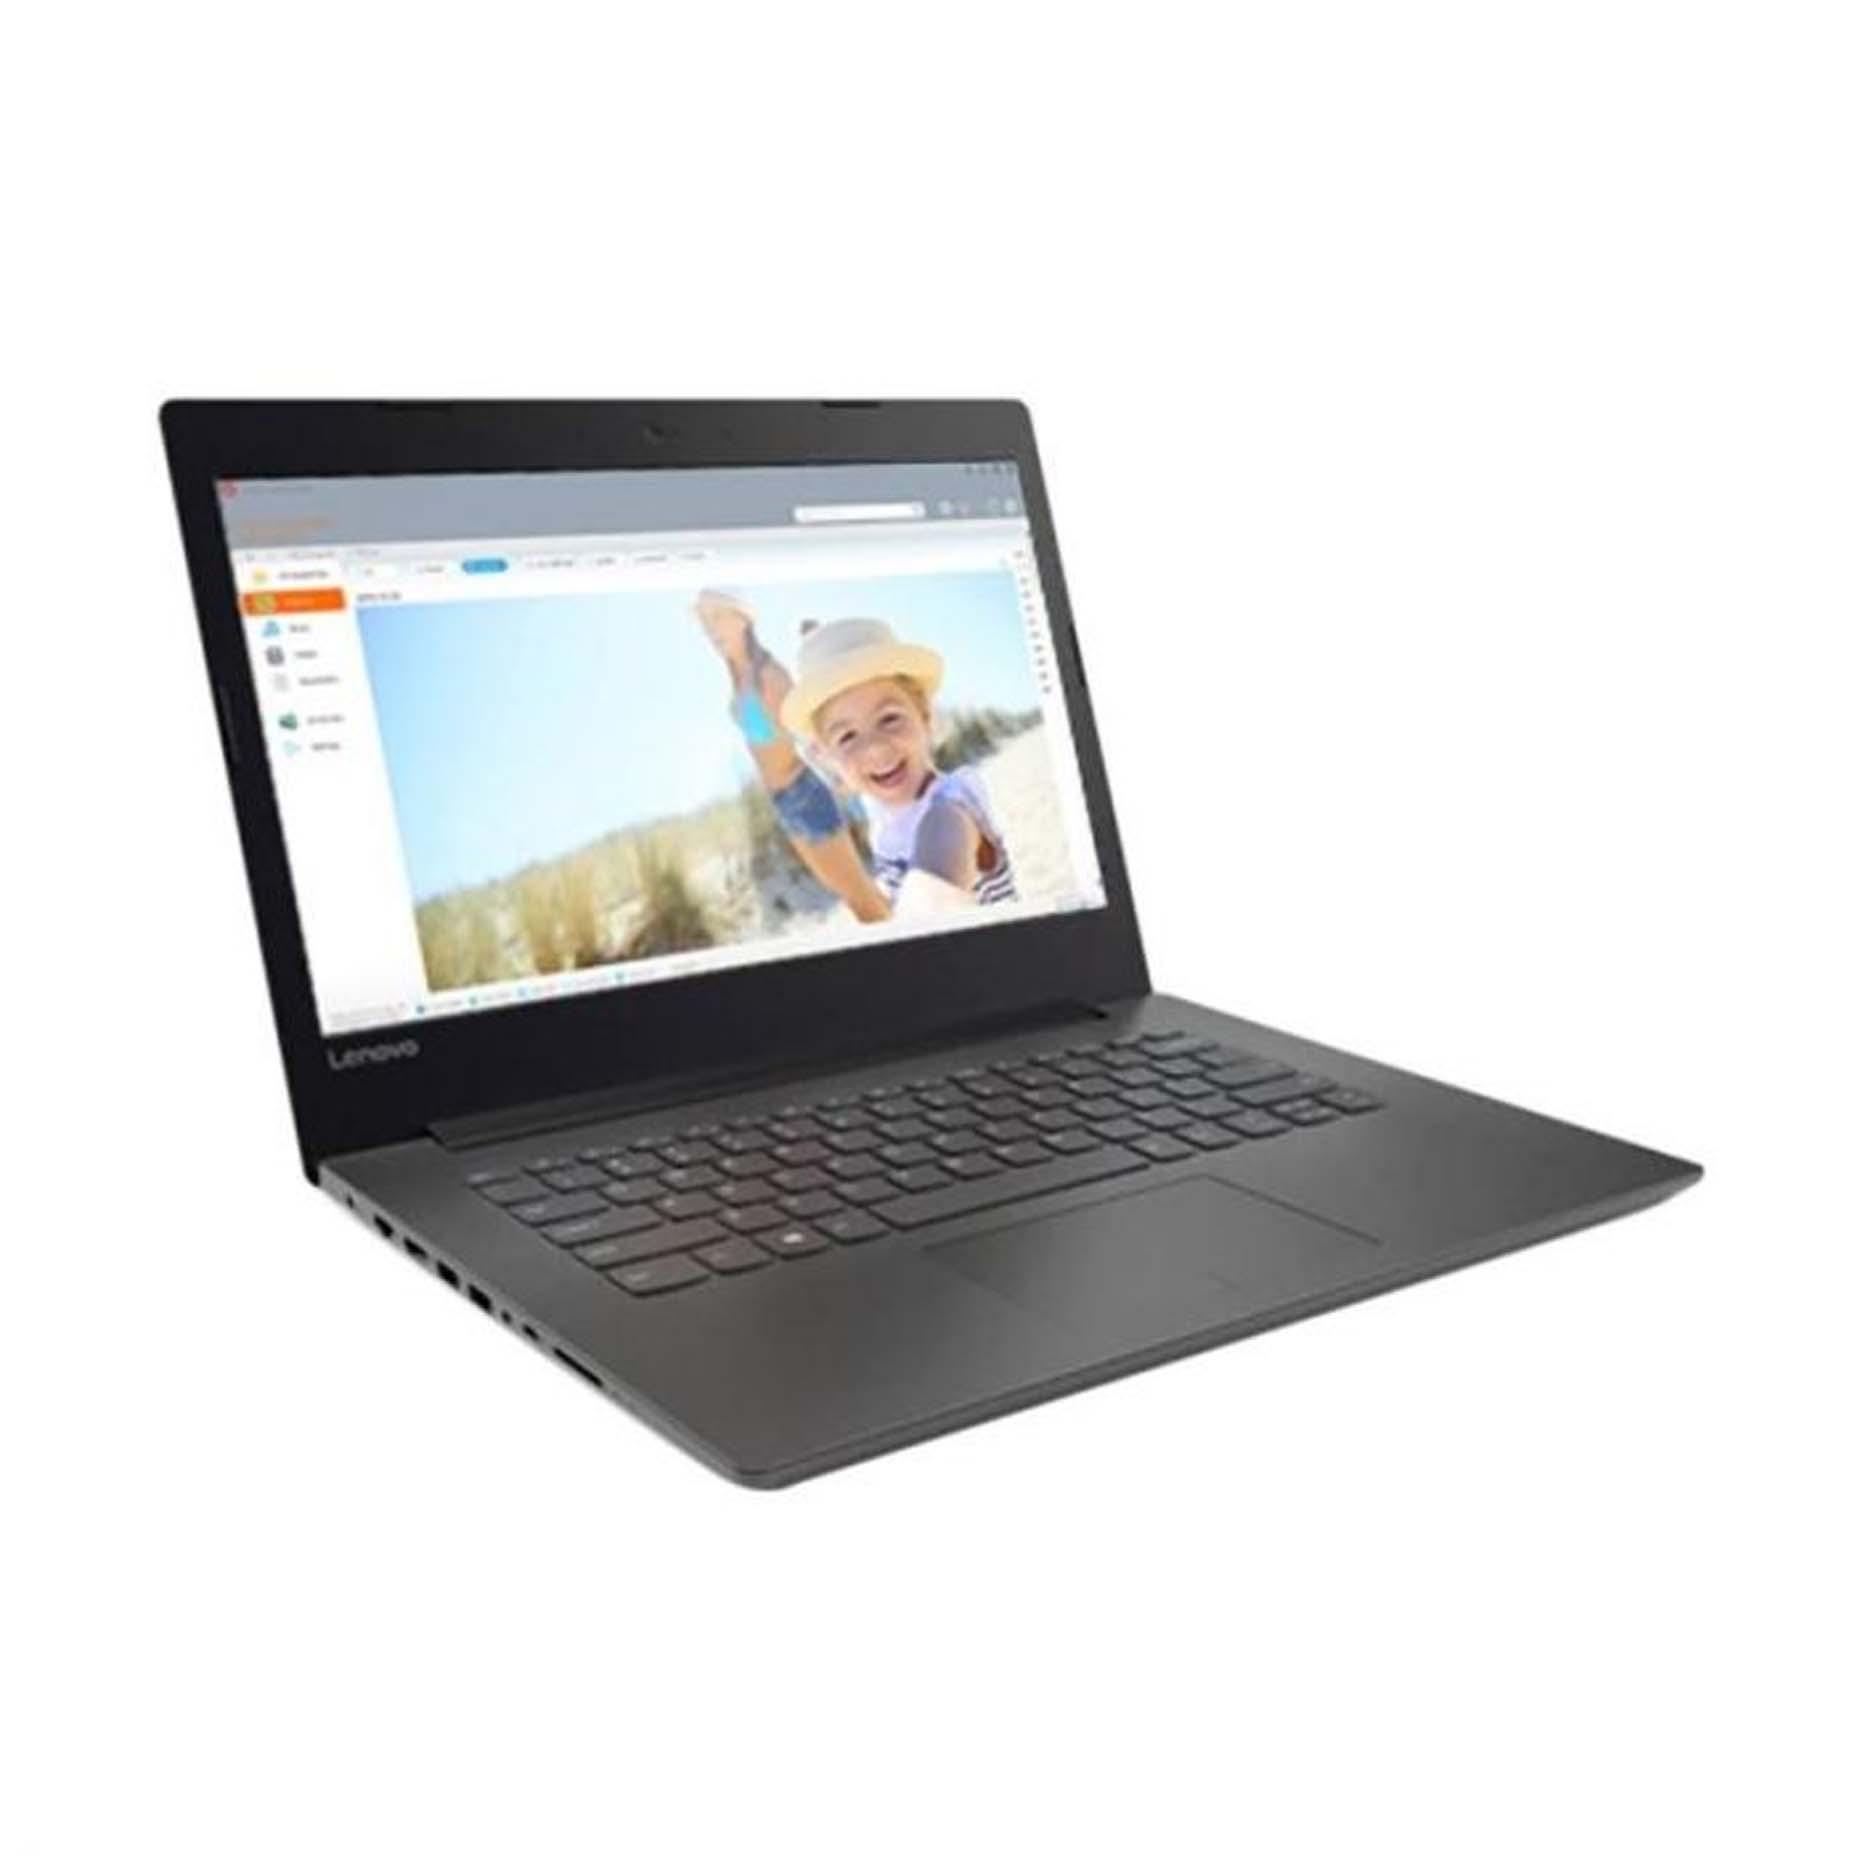 Harga Lenovo Ideapad IP 330-14AST 34ID Laptop AMD Dual Core A4 9125 4GB 500GB 14 Inch Windows 10 Grey